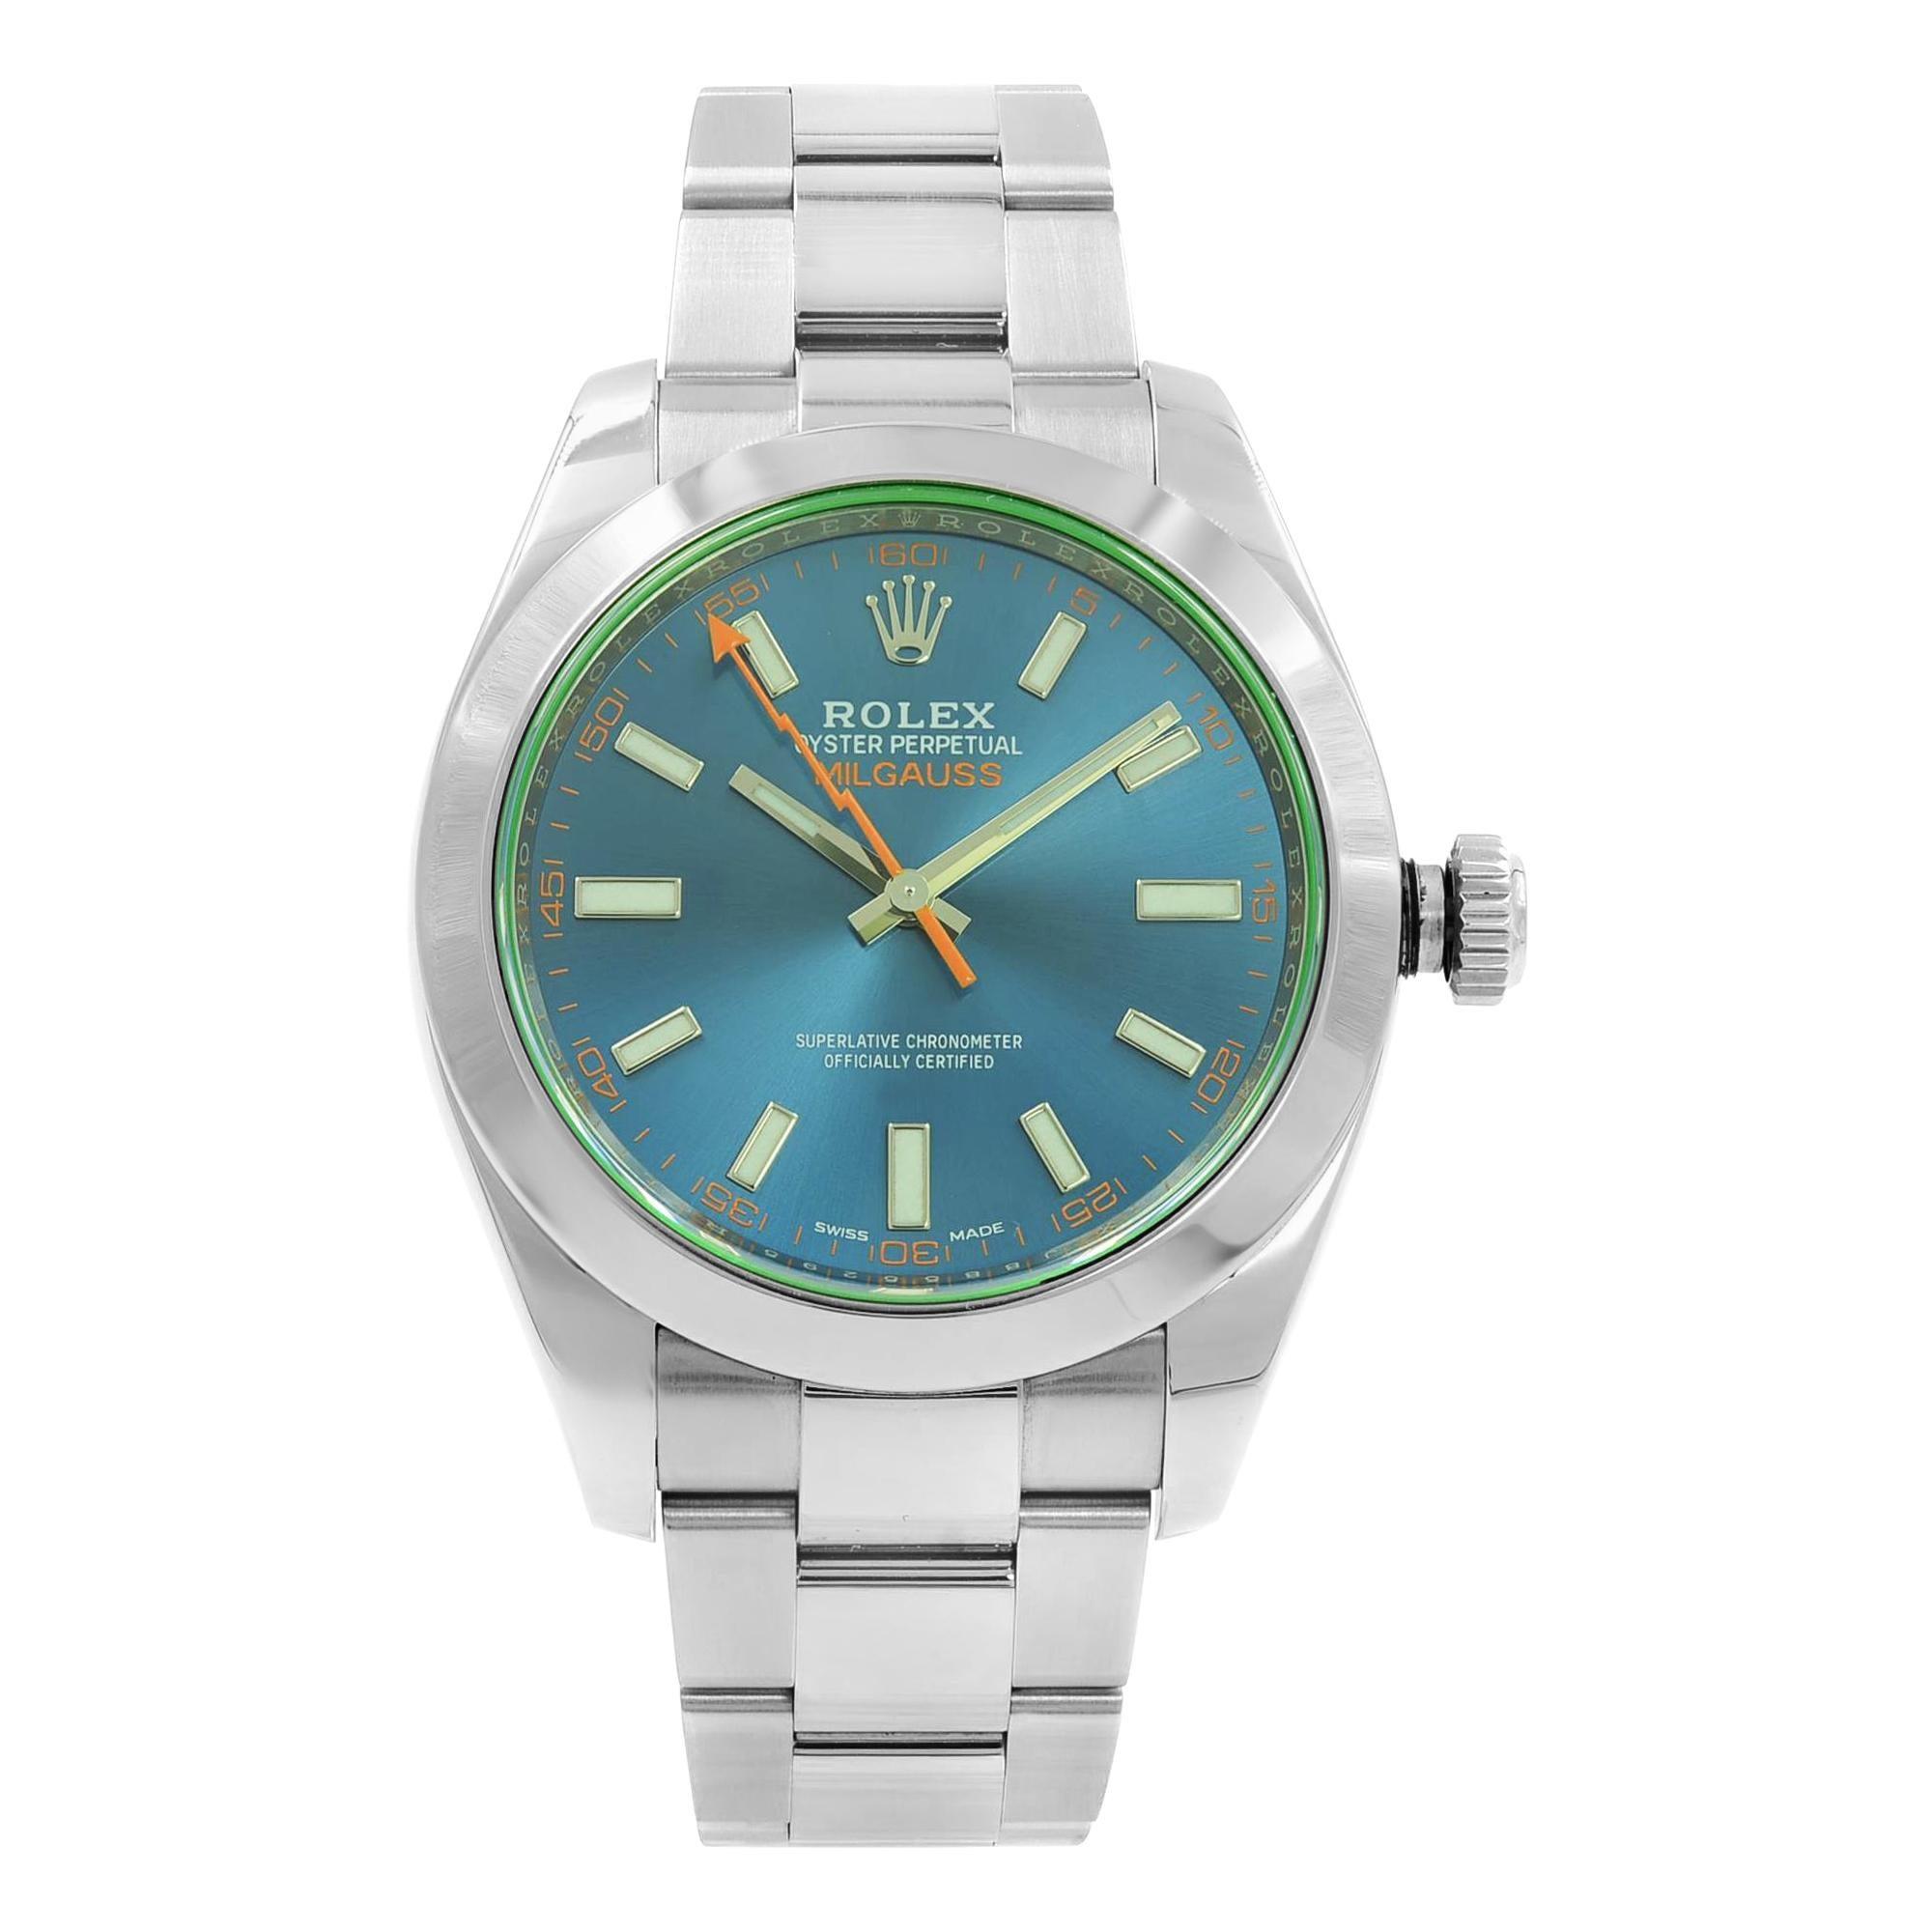 Rolex Milgauss Black Index Dial Orange Hand Automatic Steel Men\u0027s Watch  116400GV